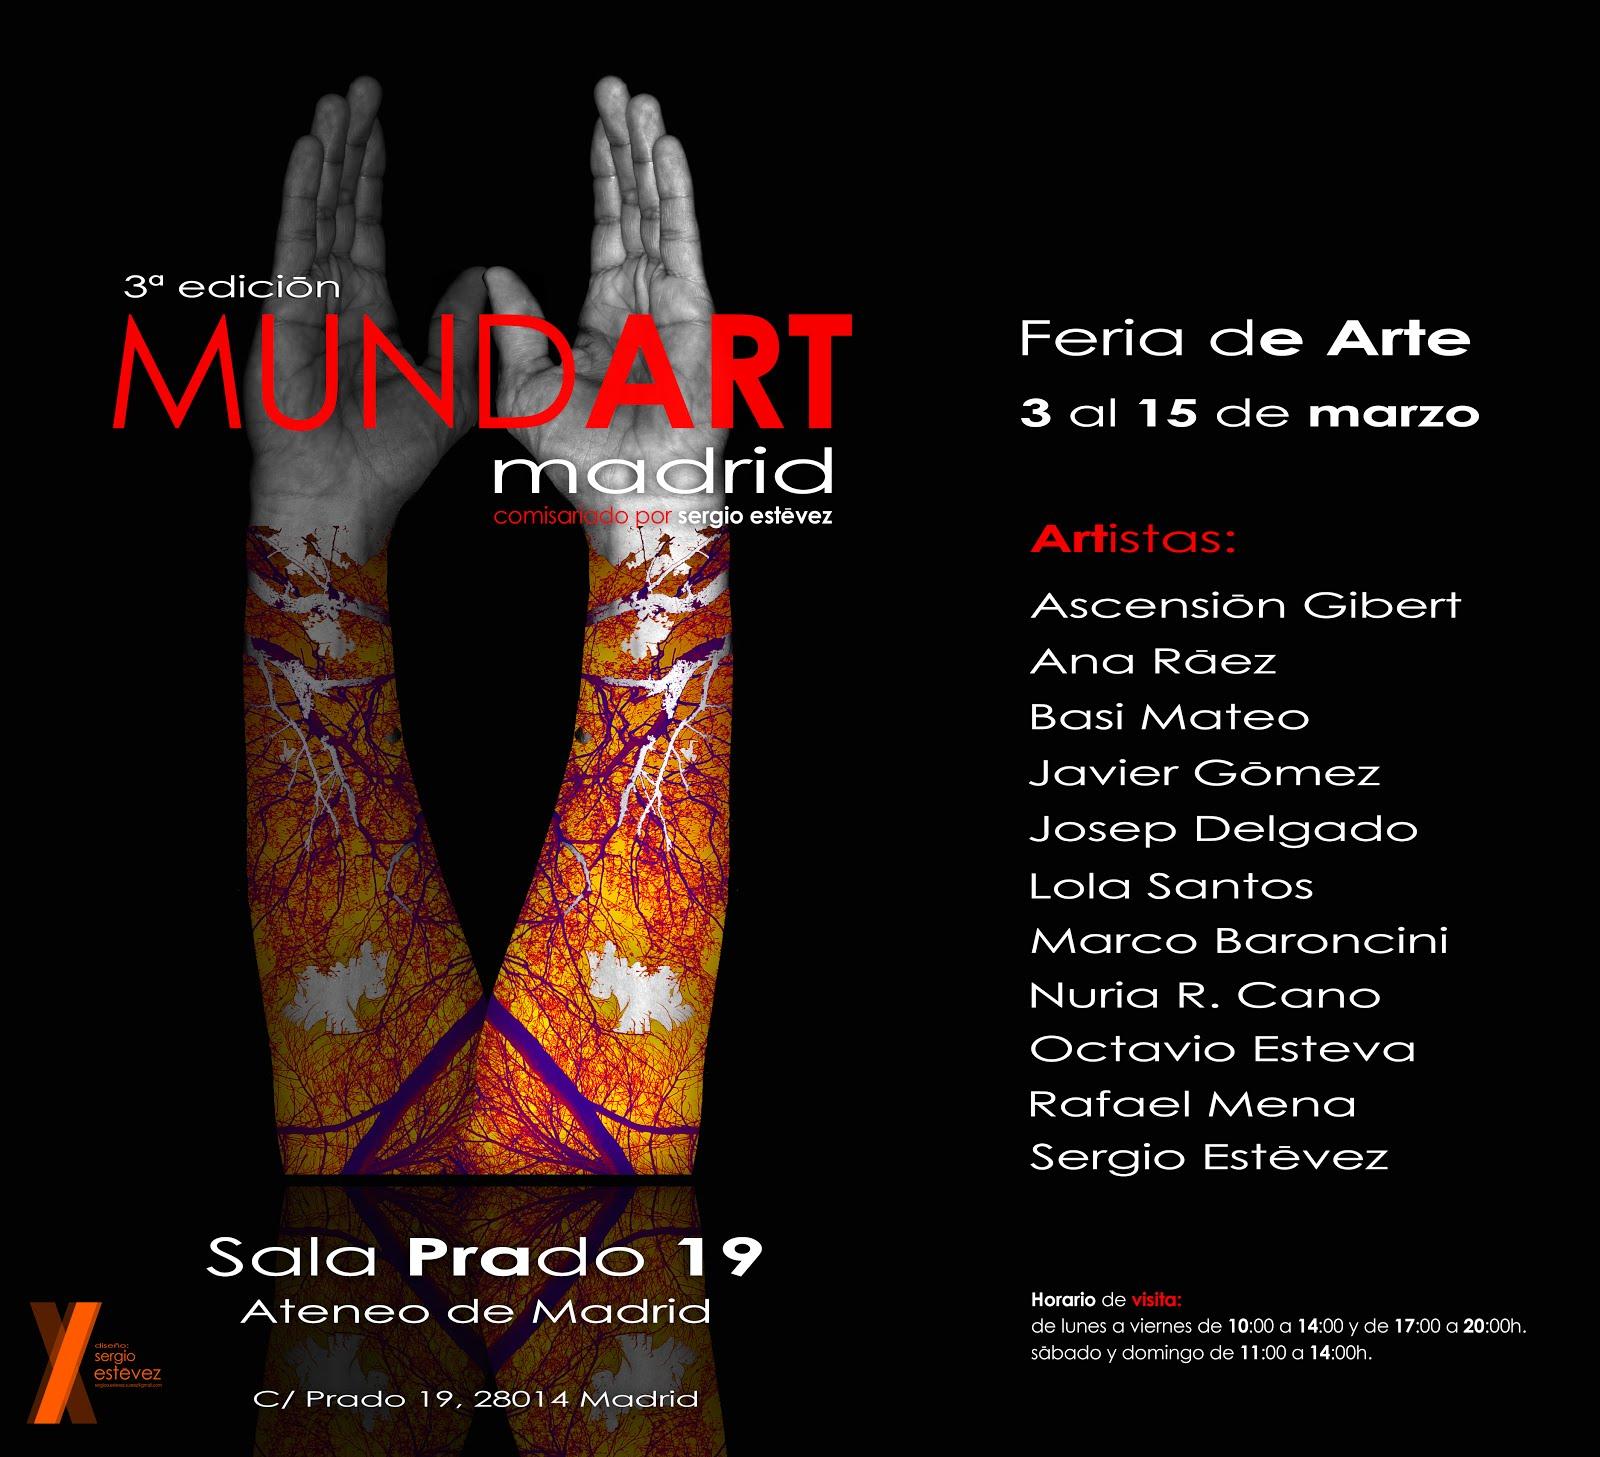 3ª Edición de Mundart Madrid